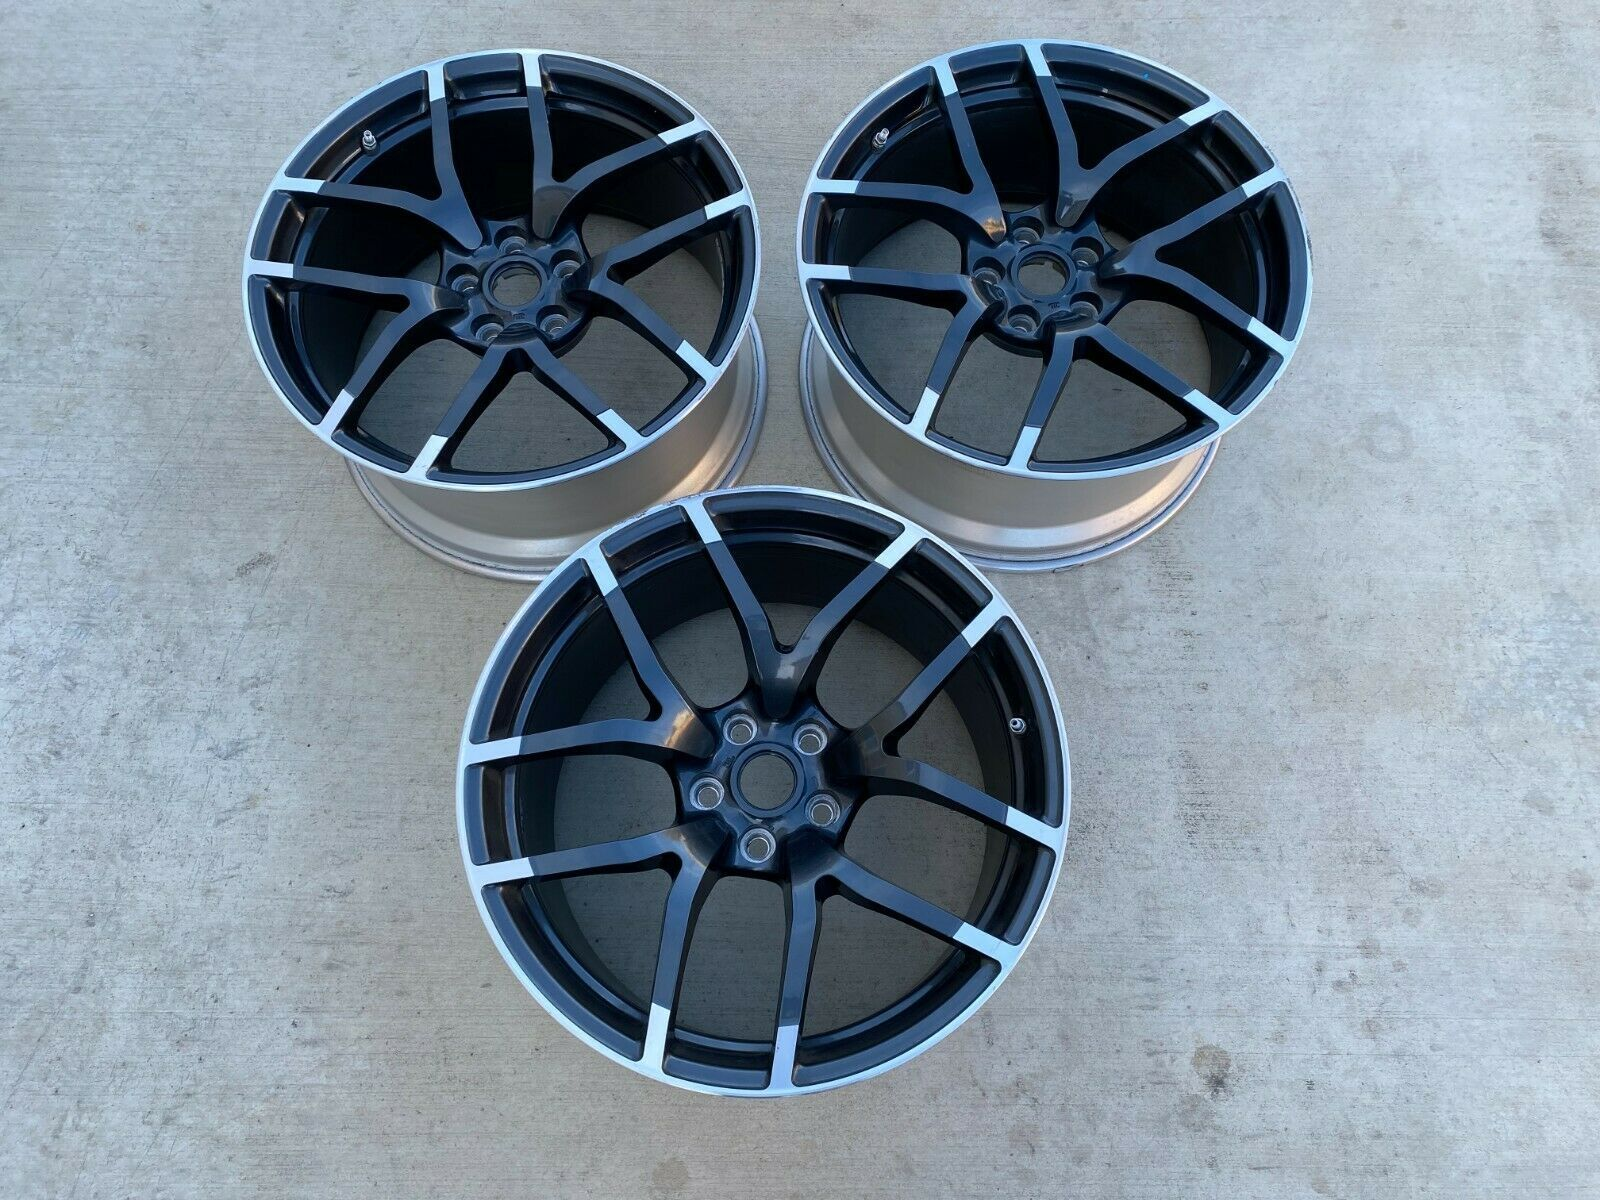 370z Rims Rims Wheel Rims Wheel